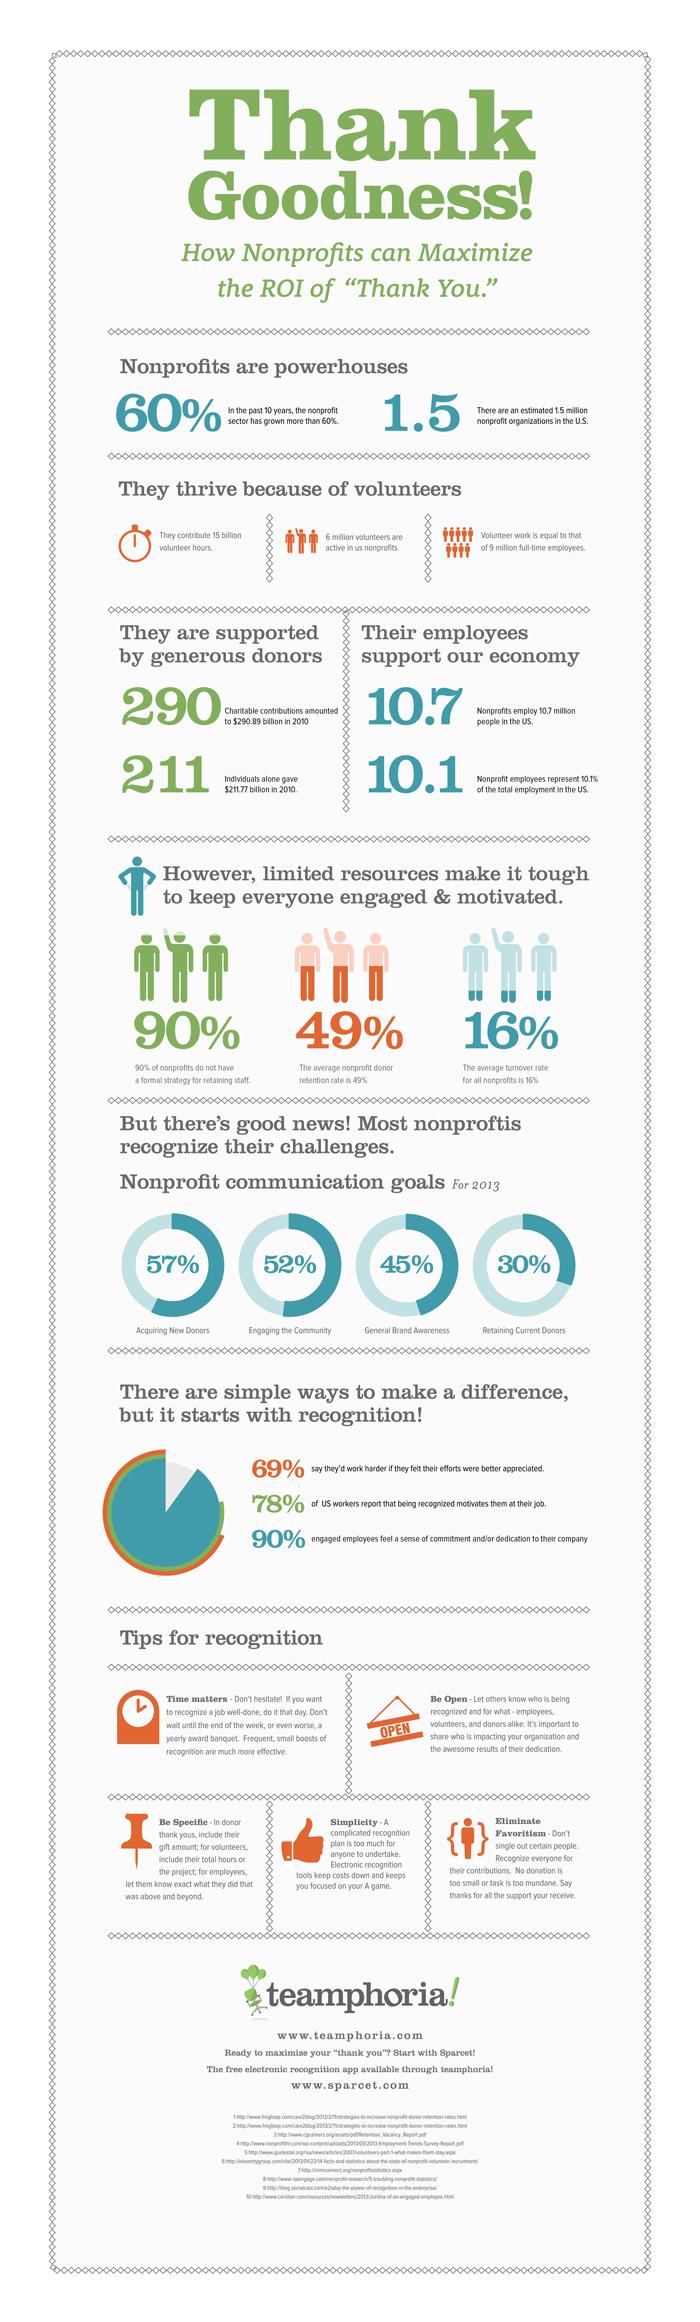 teamphoria-nonprof-infographic